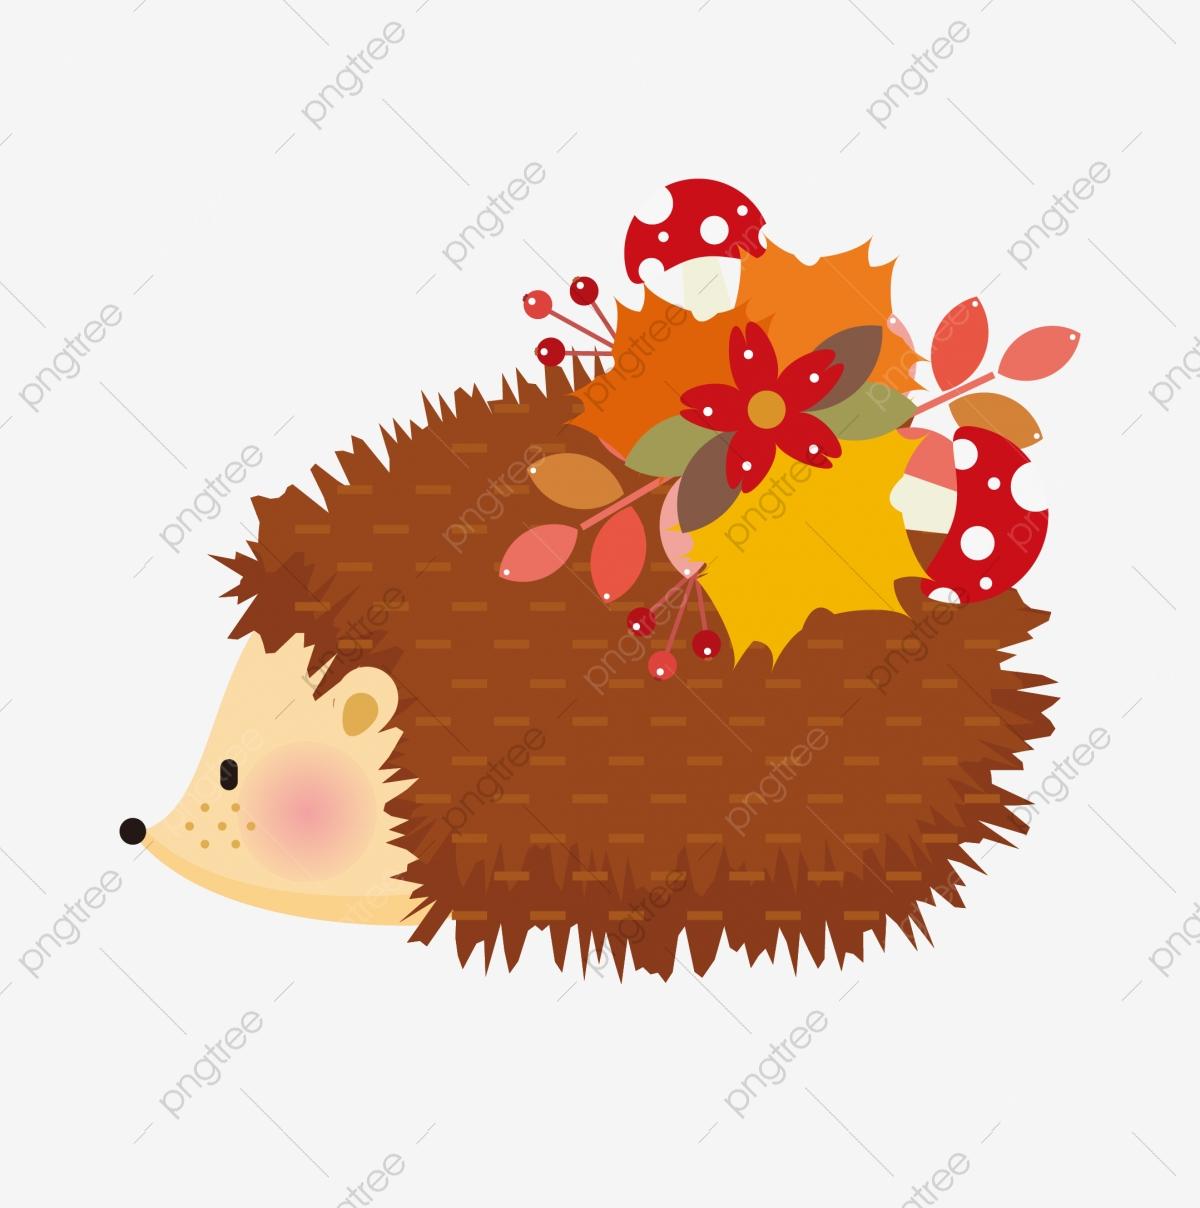 Hedgehog clipart hedgehod. On the stump grey